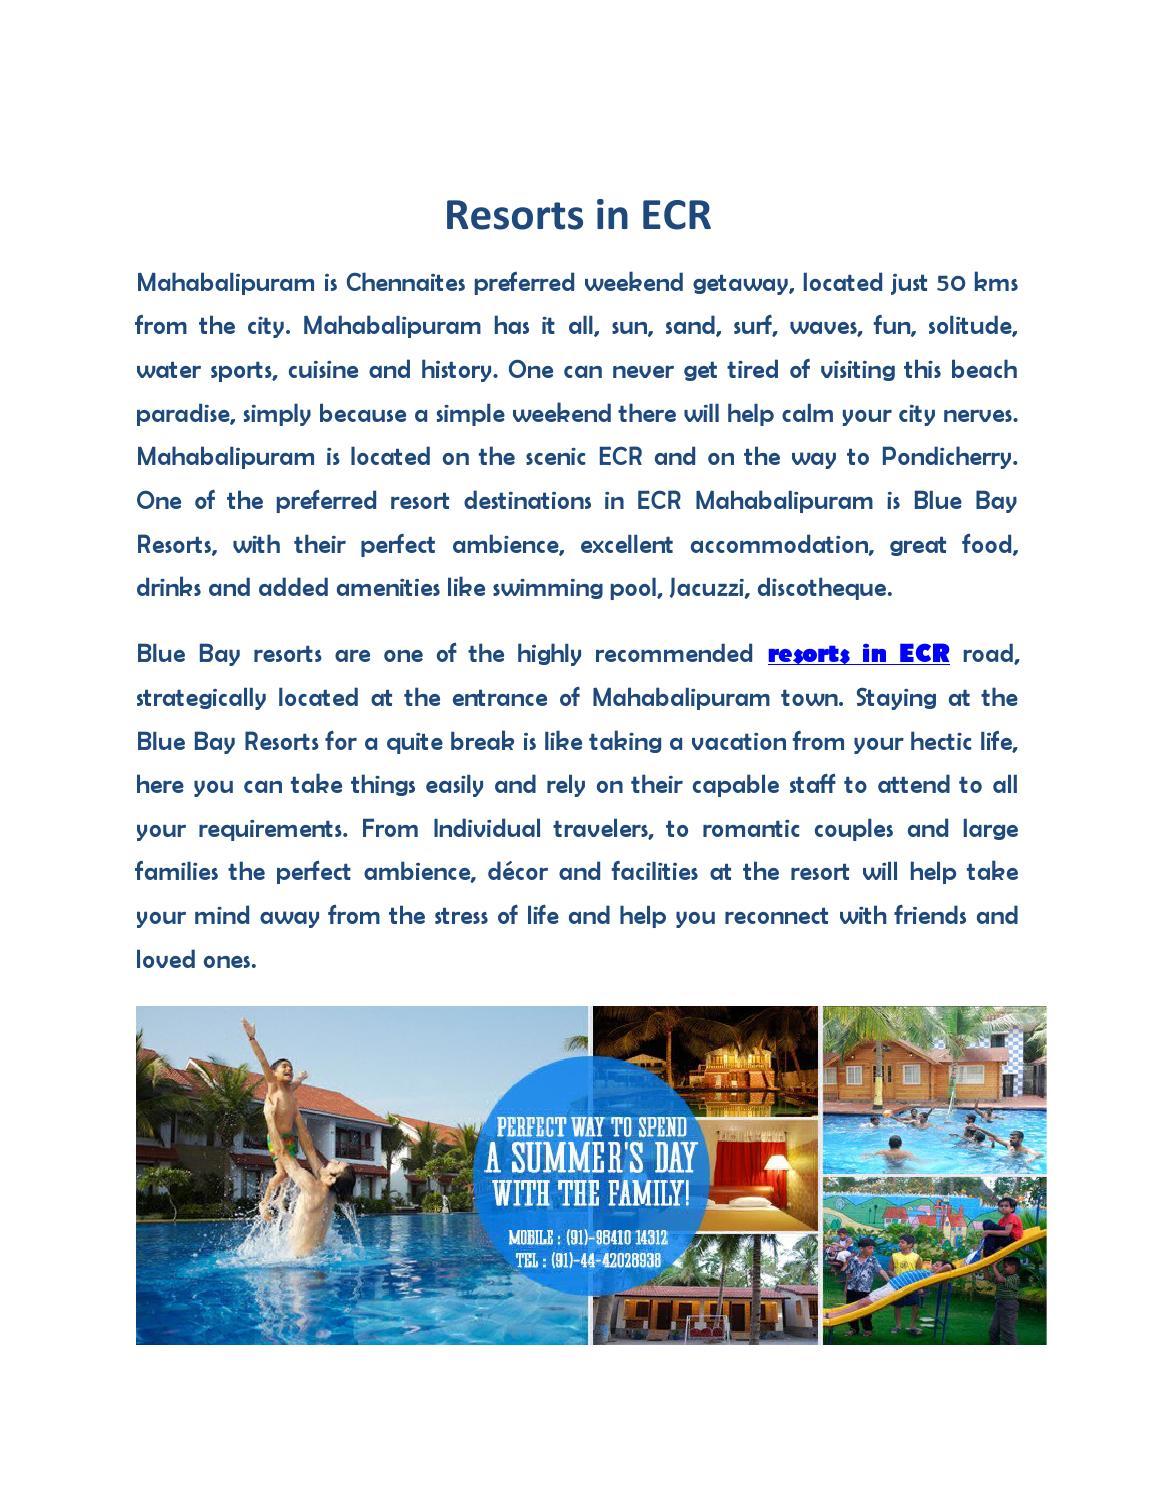 Resorts in ecr mahabalipuram chennai by - Resorts in ecr with swimming pool ...